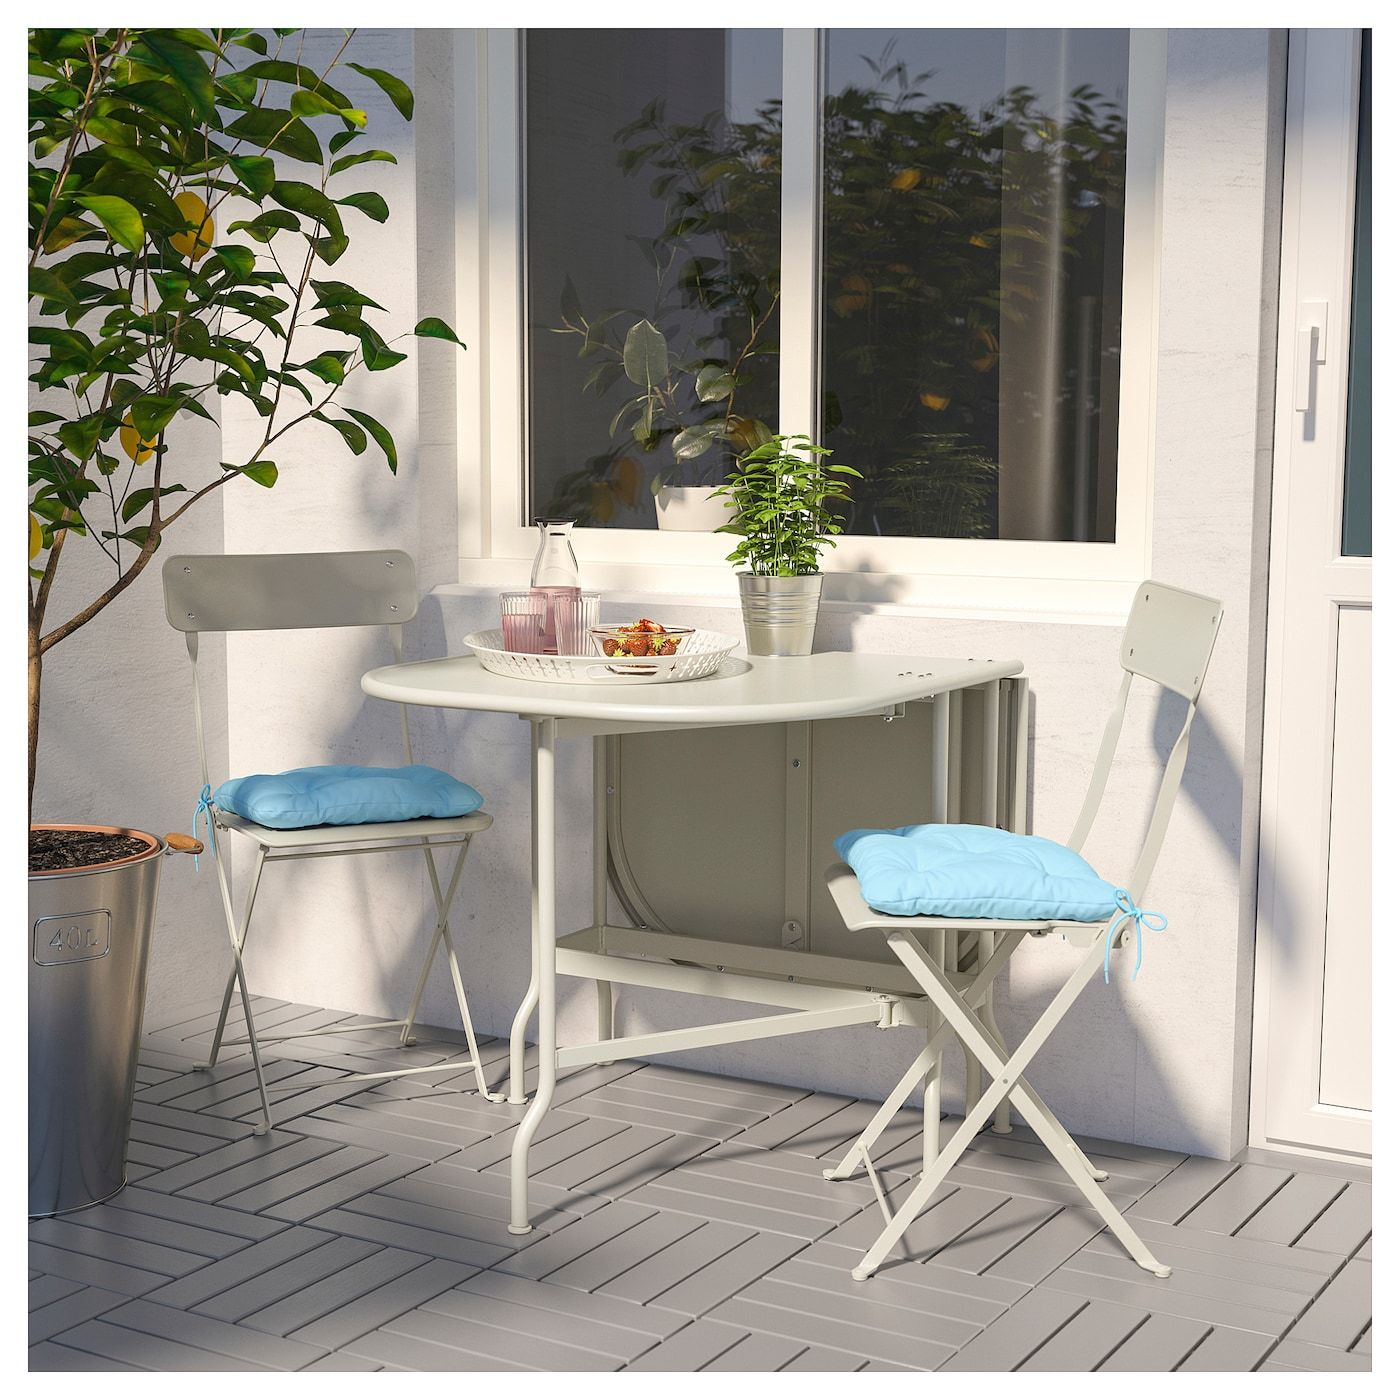 Ikea Sedie Giardino Pieghevoli.Saltholmen Tavolo 2 Sedie Pieghevoli Giardino Beige Kuddarna